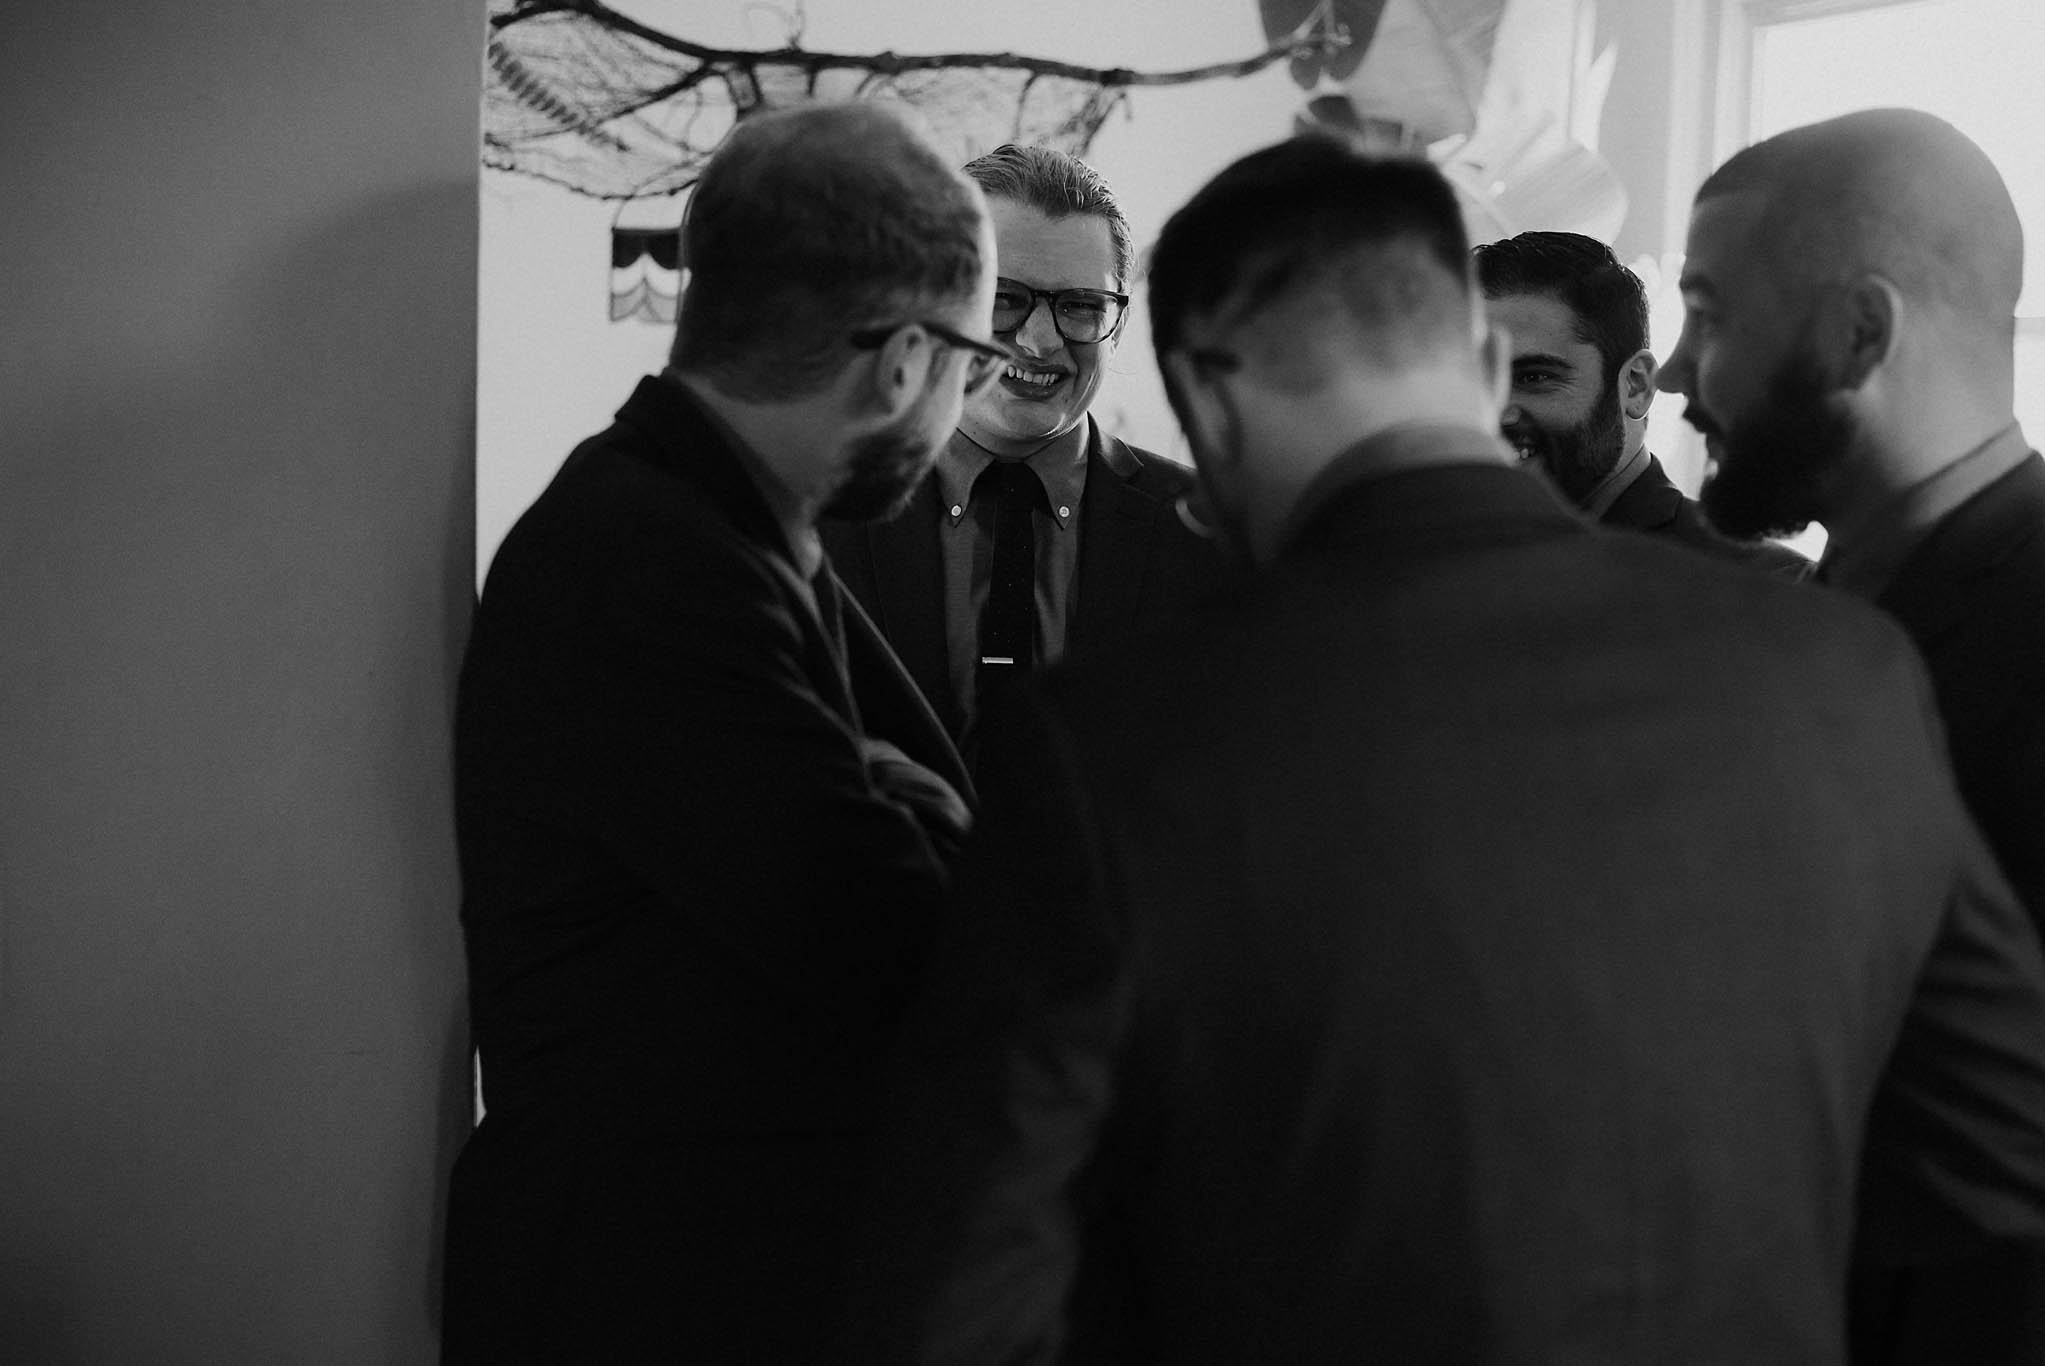 cincinnati warehouse wedding photographer groom groomsmen laughing